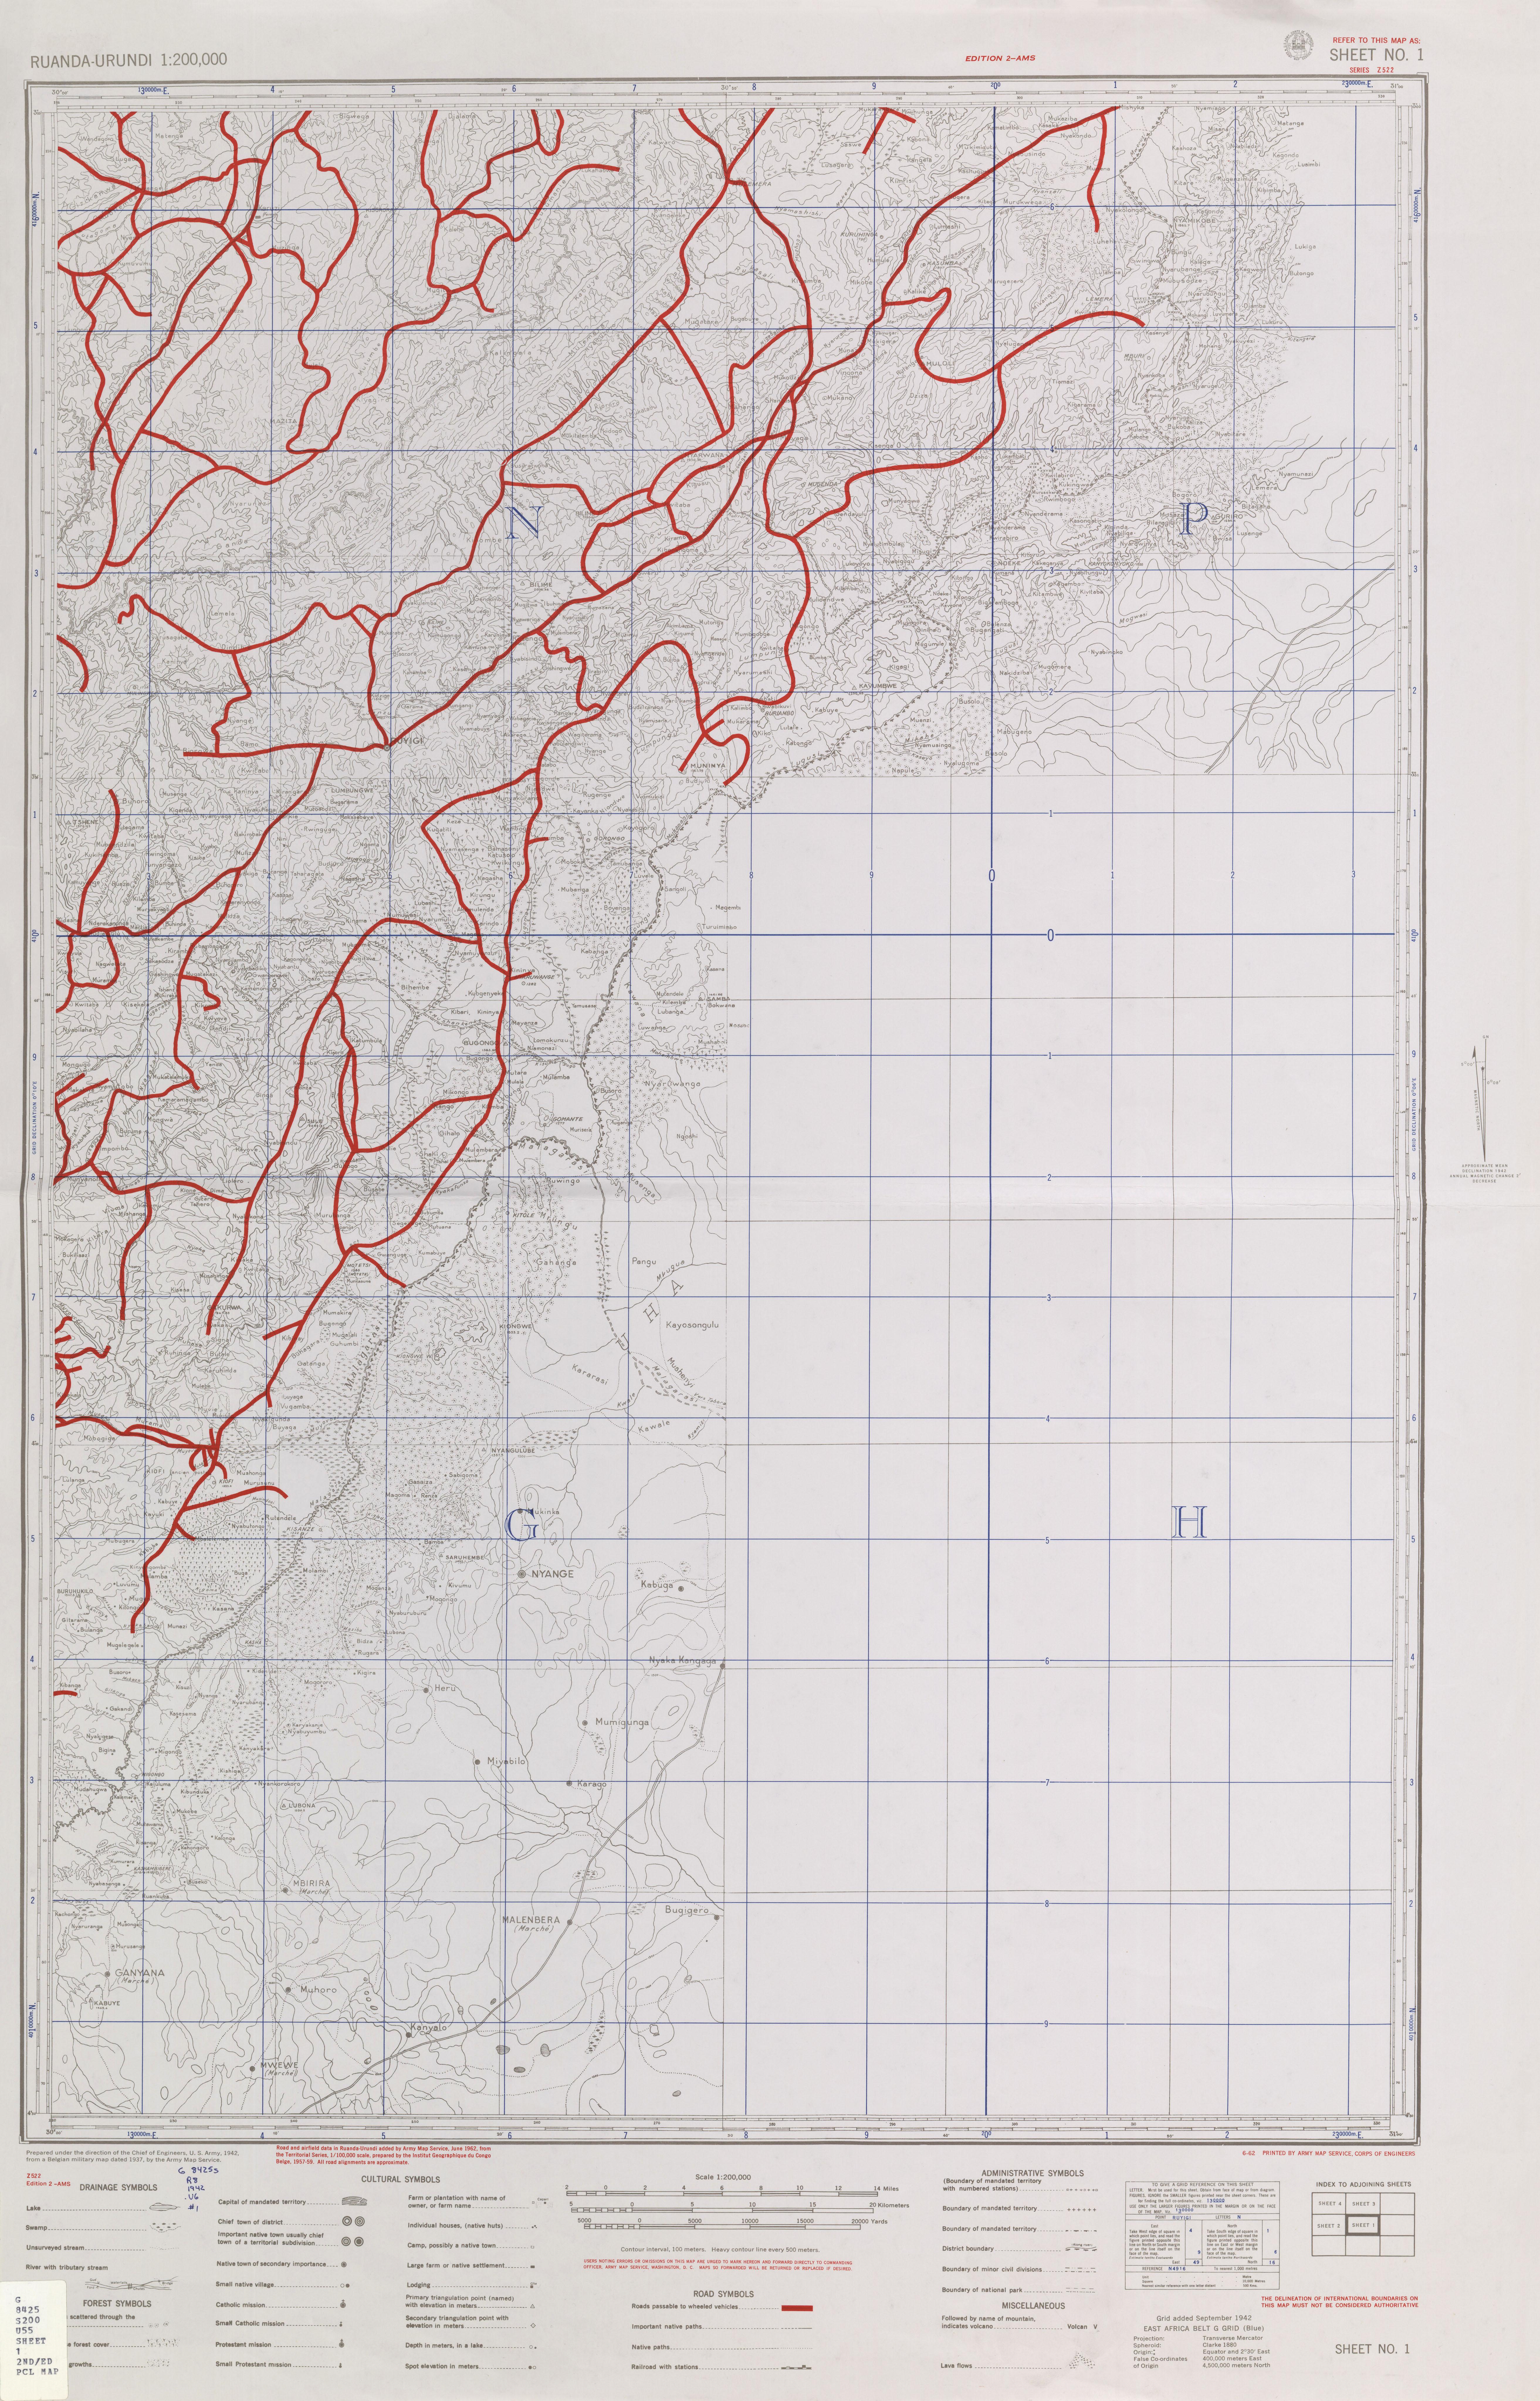 Ruanda-Urundi AMS Topographic Maps - Perry-Castañeda Map ...